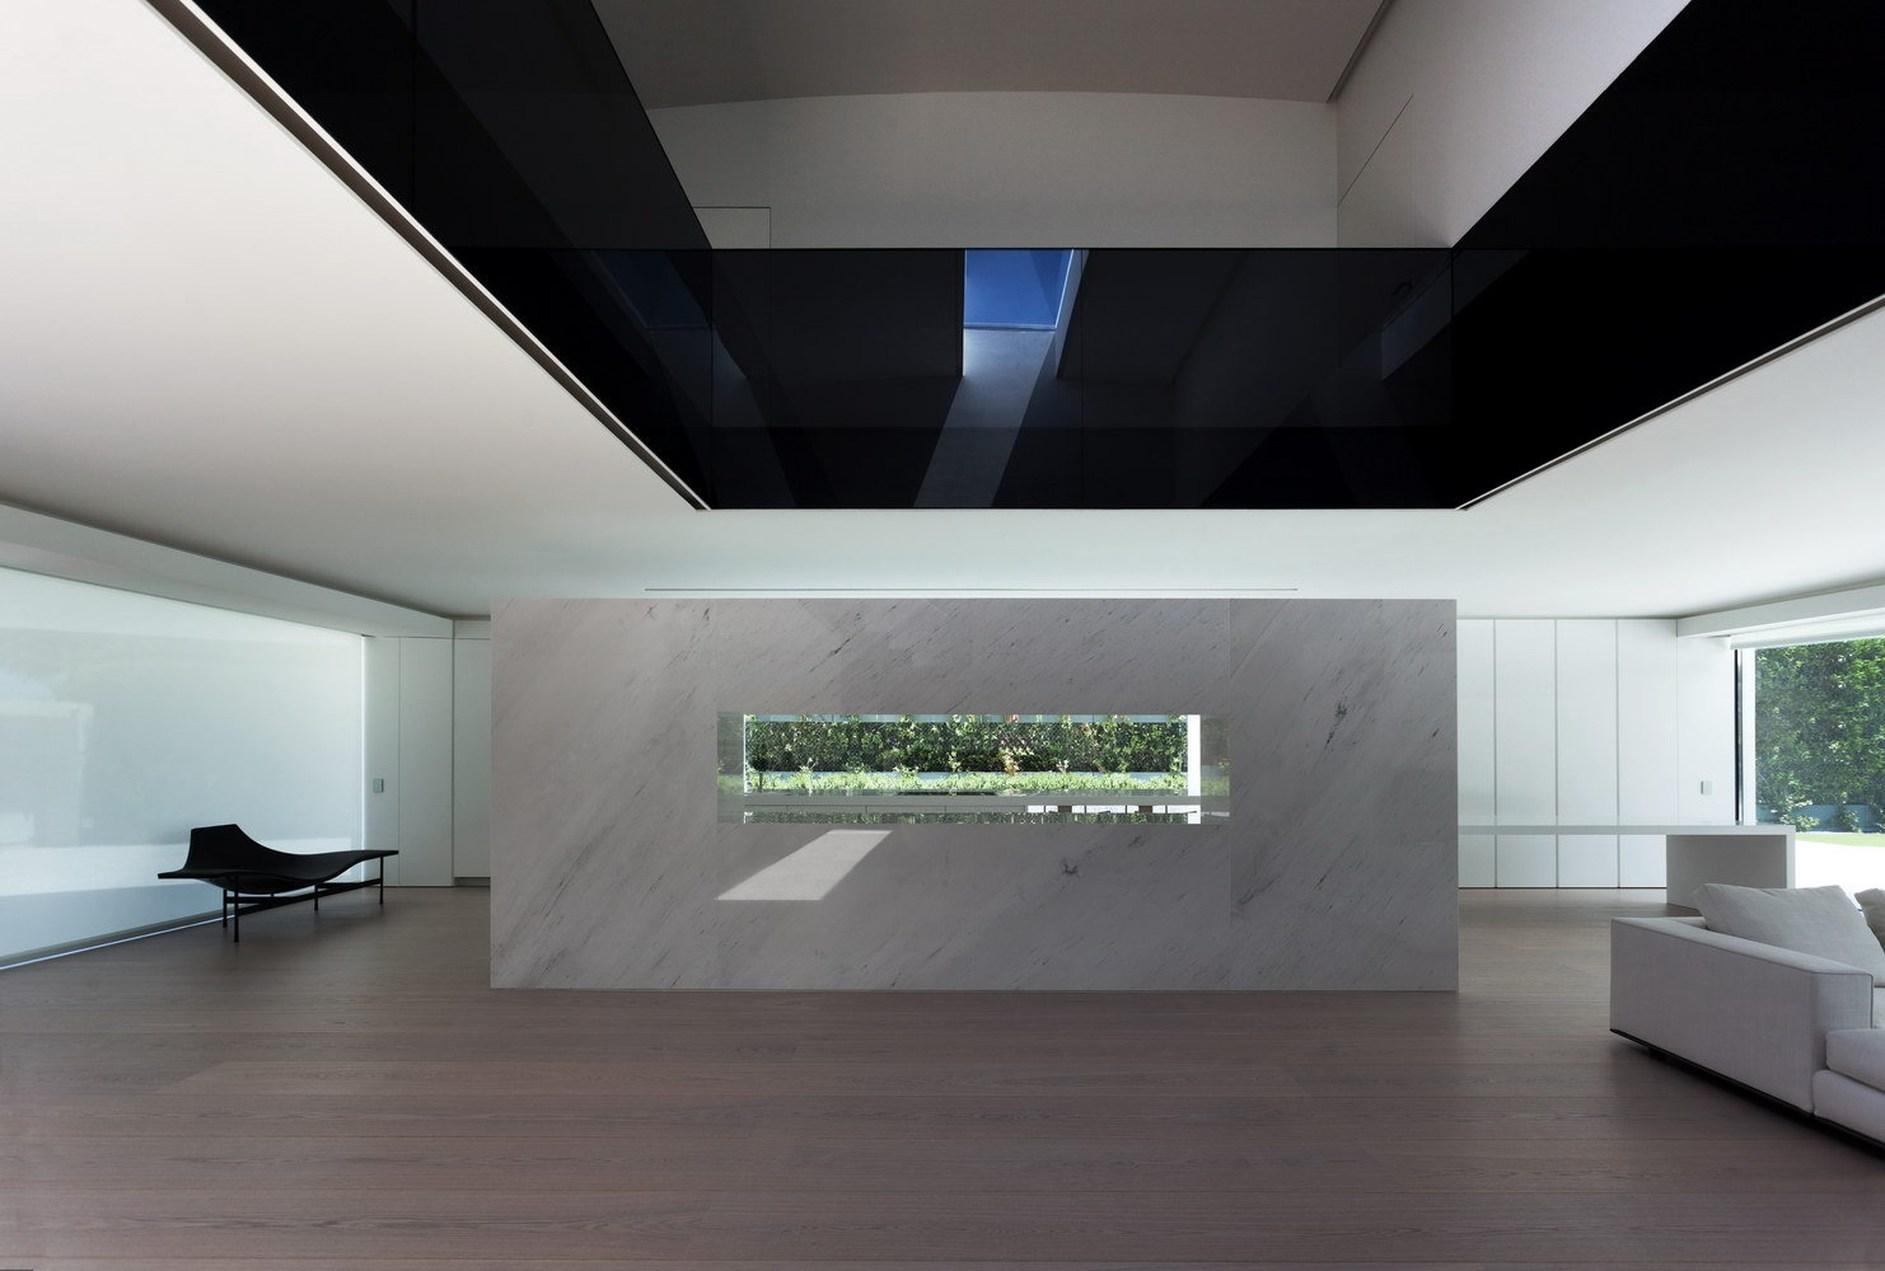 Balint house by fran silvestre arquitectos karmatrendz - Fran silvestre arquitectos ...